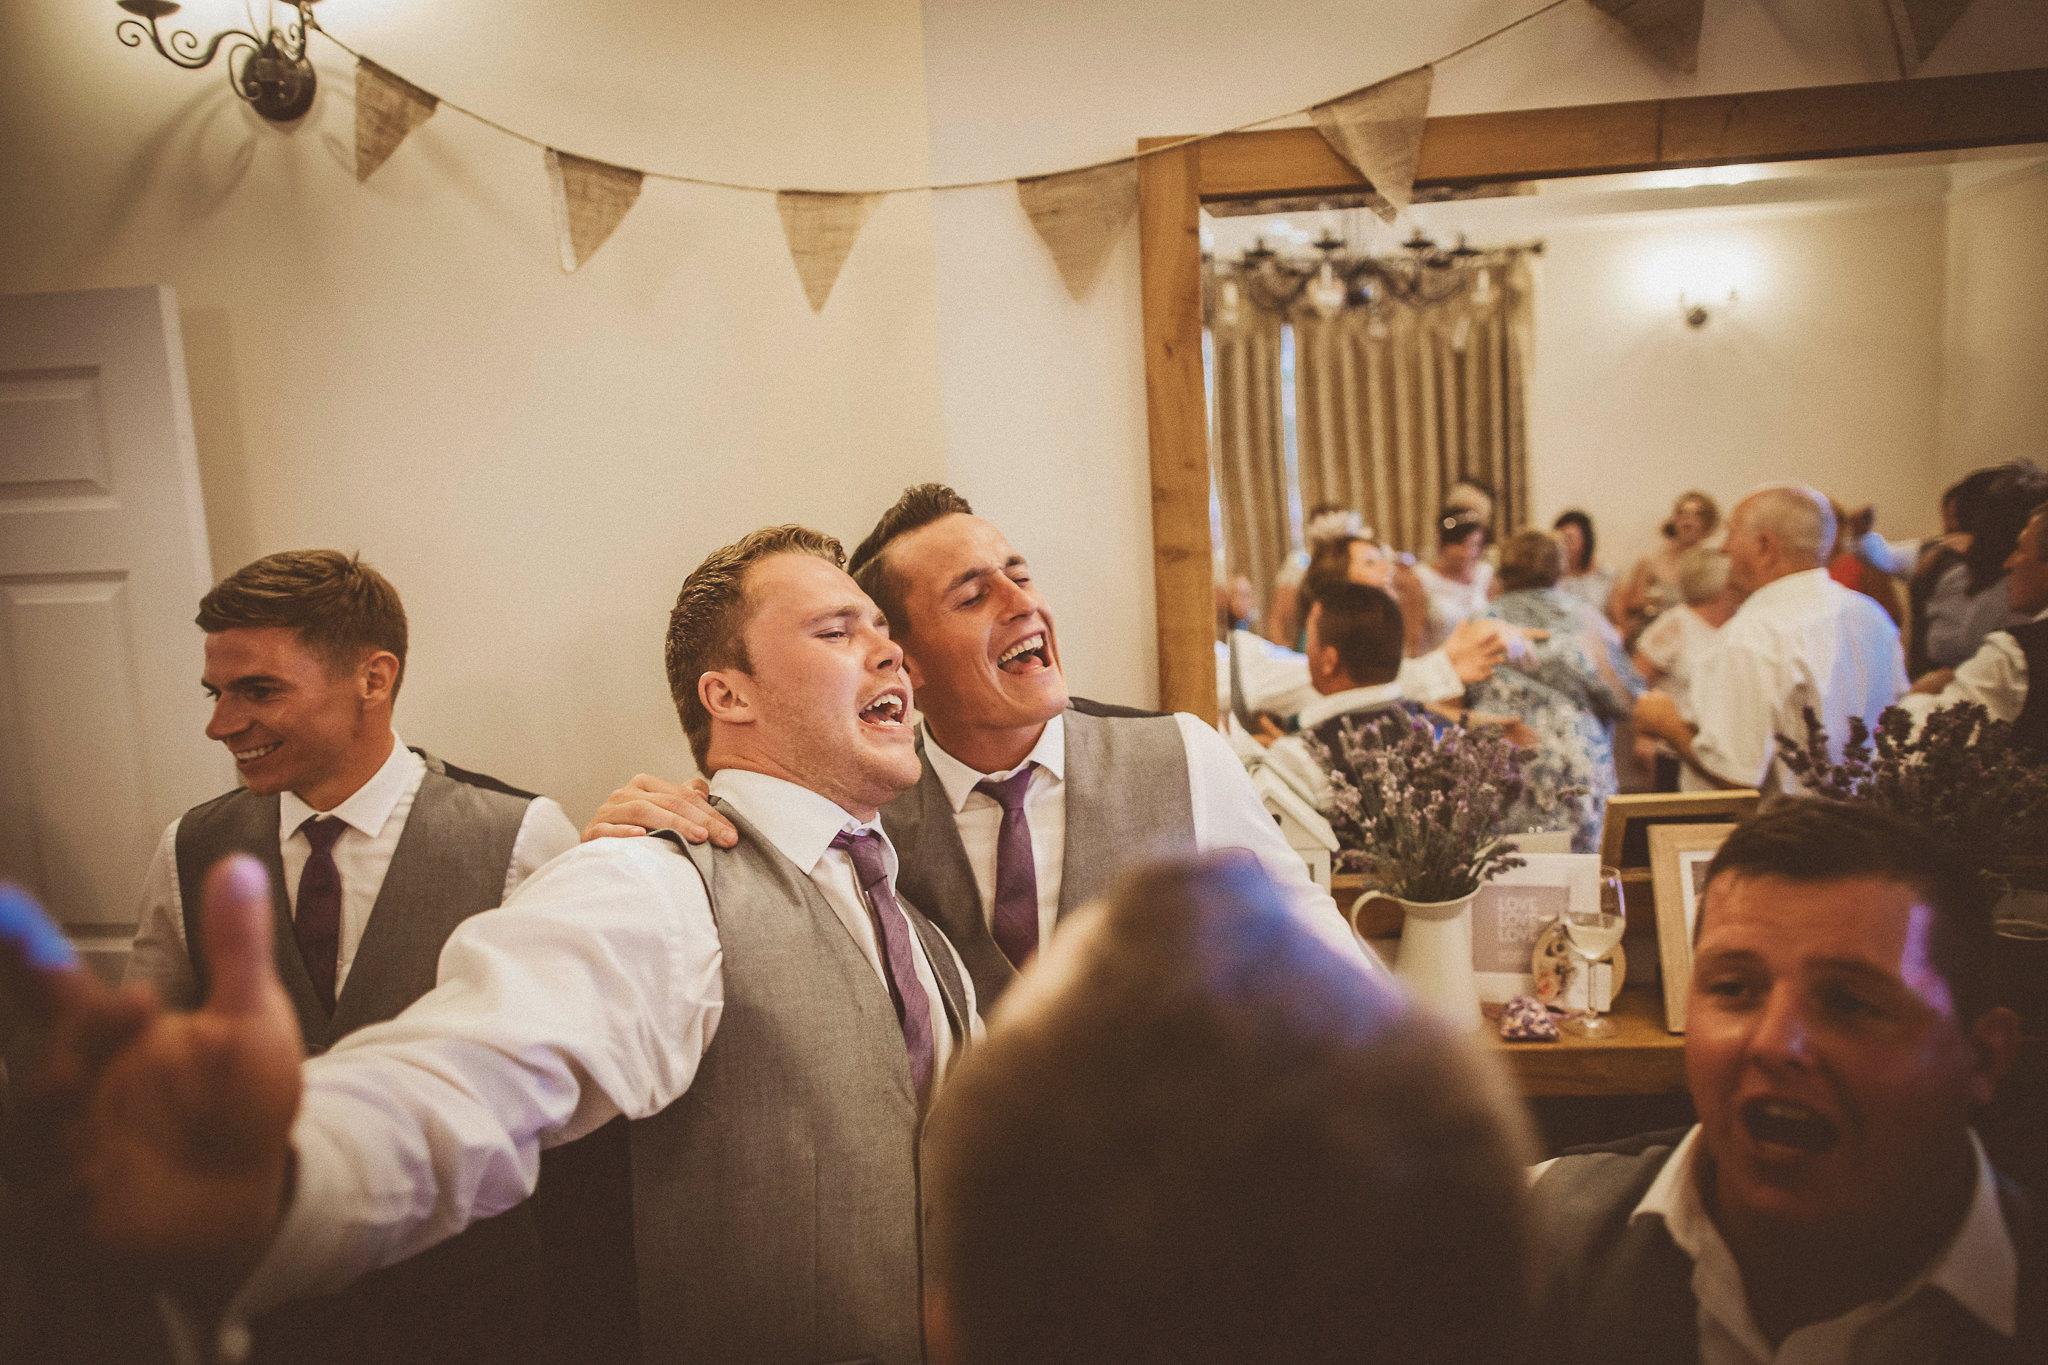 paul-marbrook-Caer-Llan-Wedding-Photographer-90096